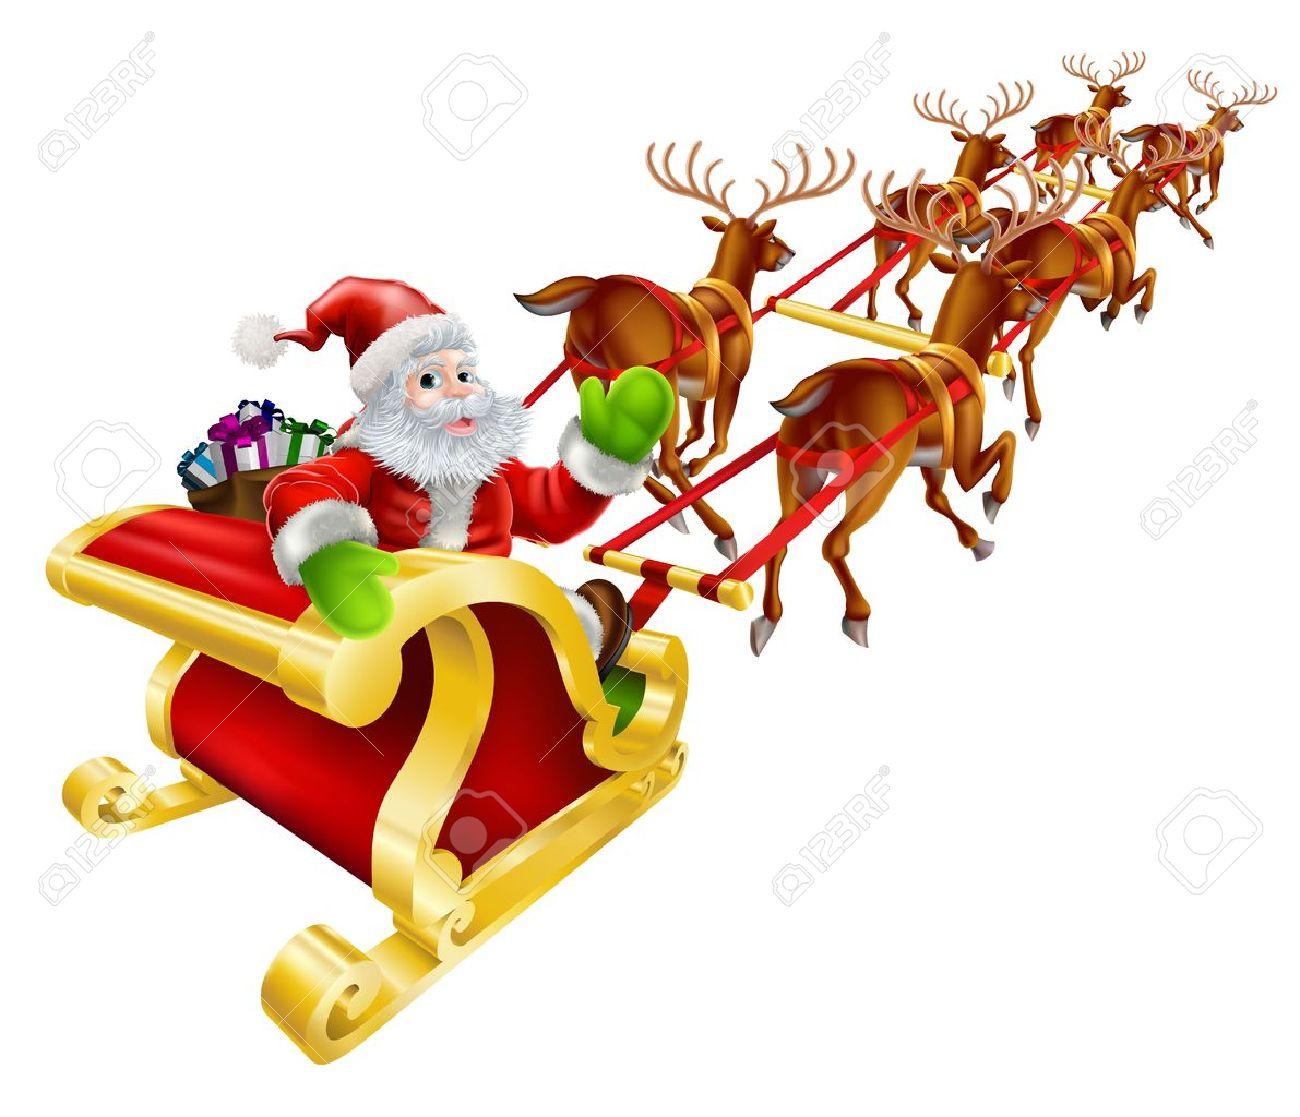 Horn sledge clipart #6